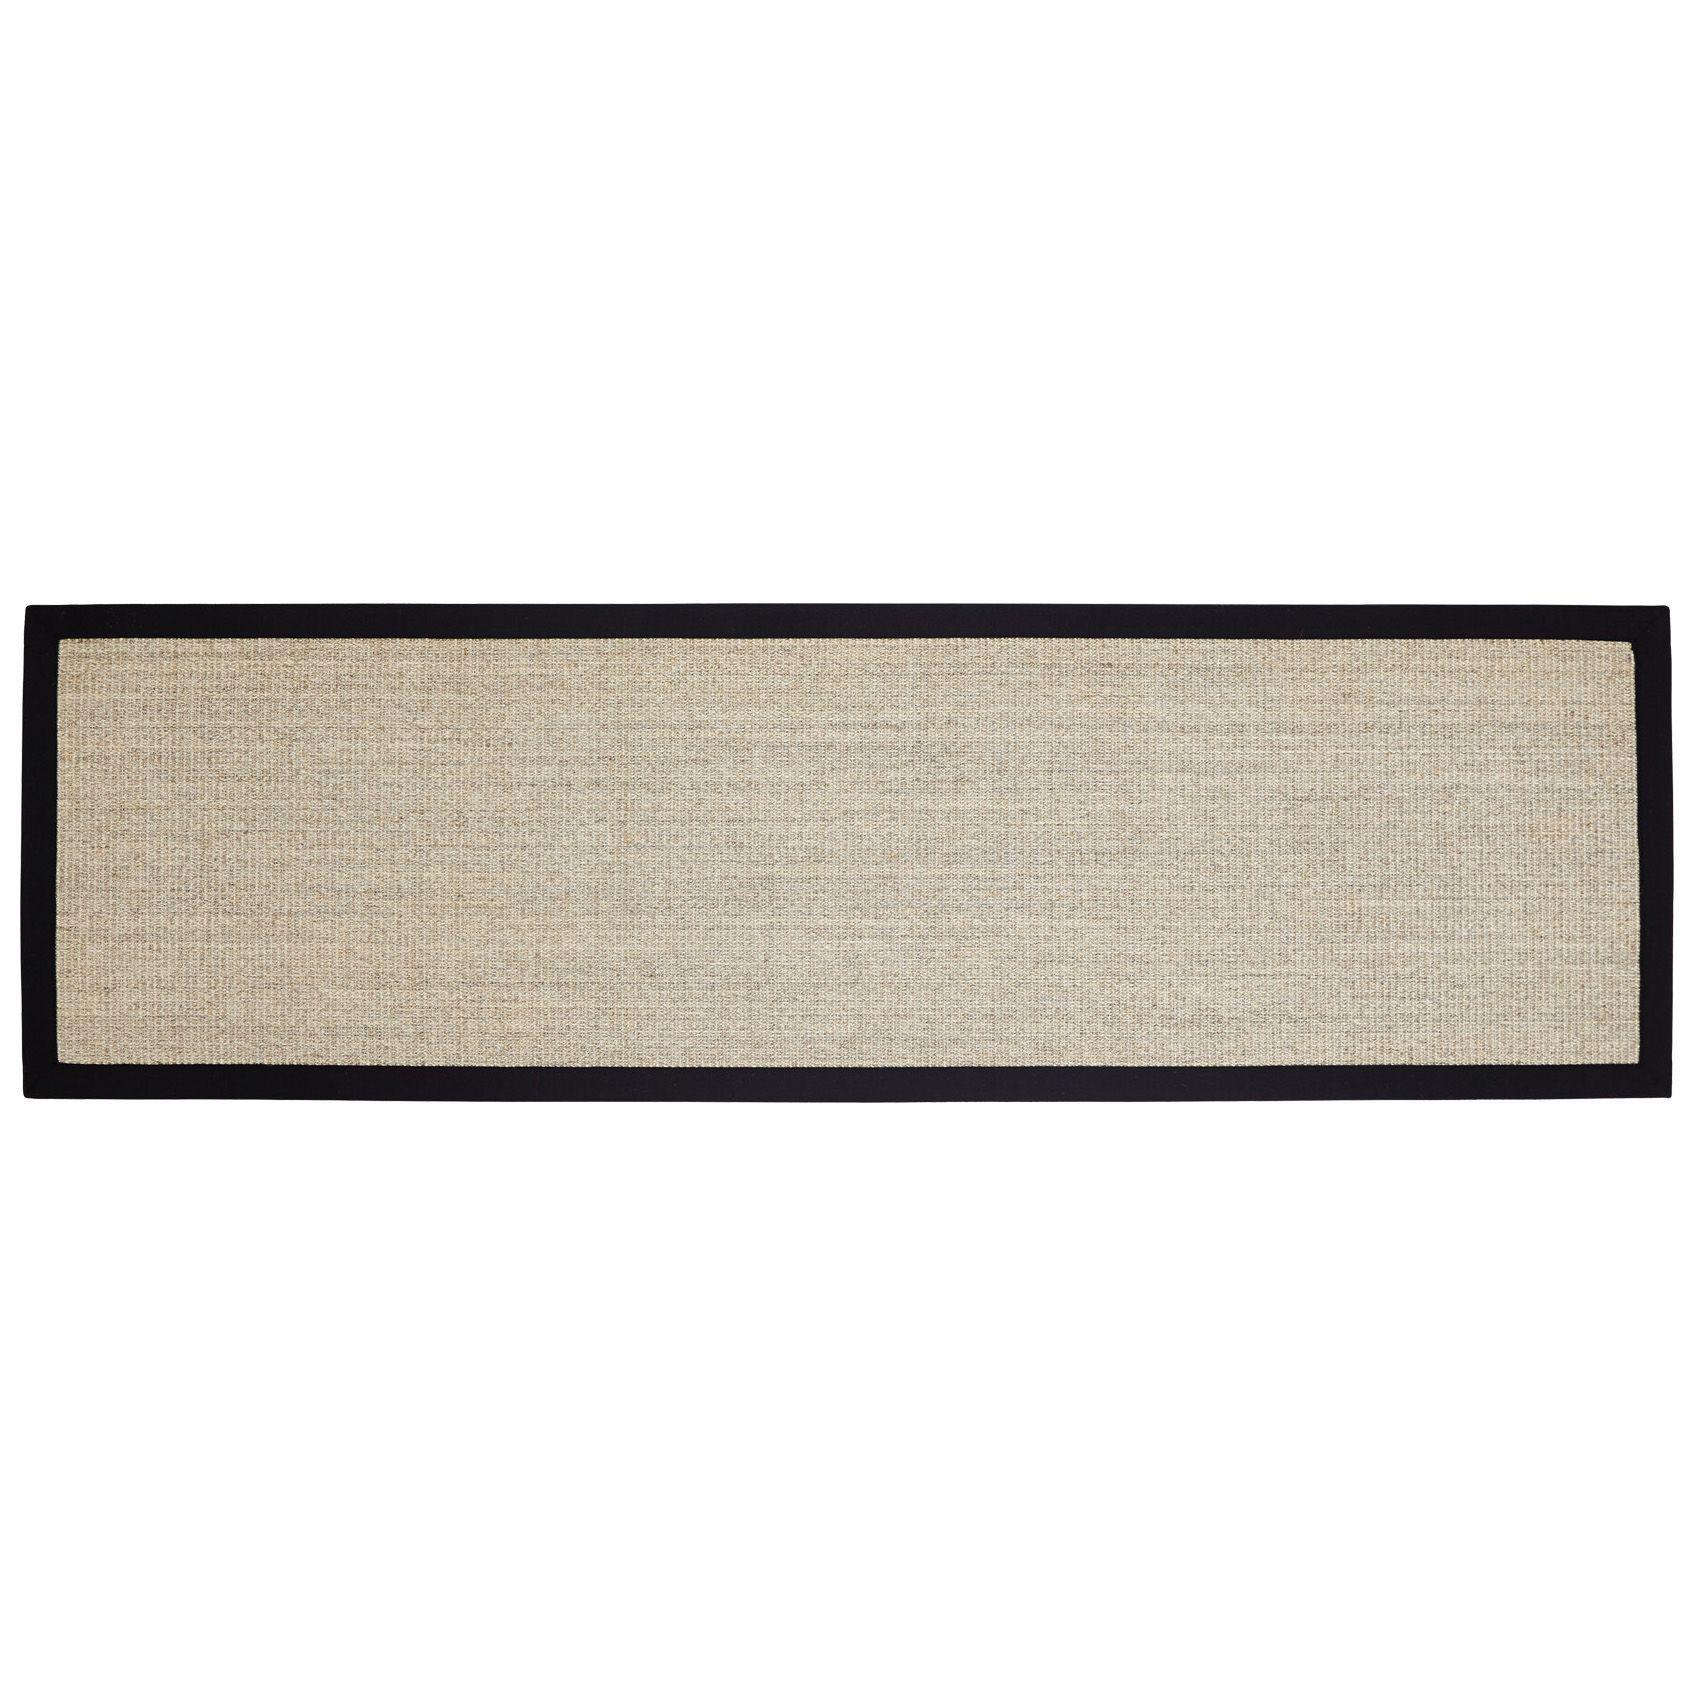 Colours Fedora Black Flatweave With Cotton Border Runner (l)200cm (w)60cm